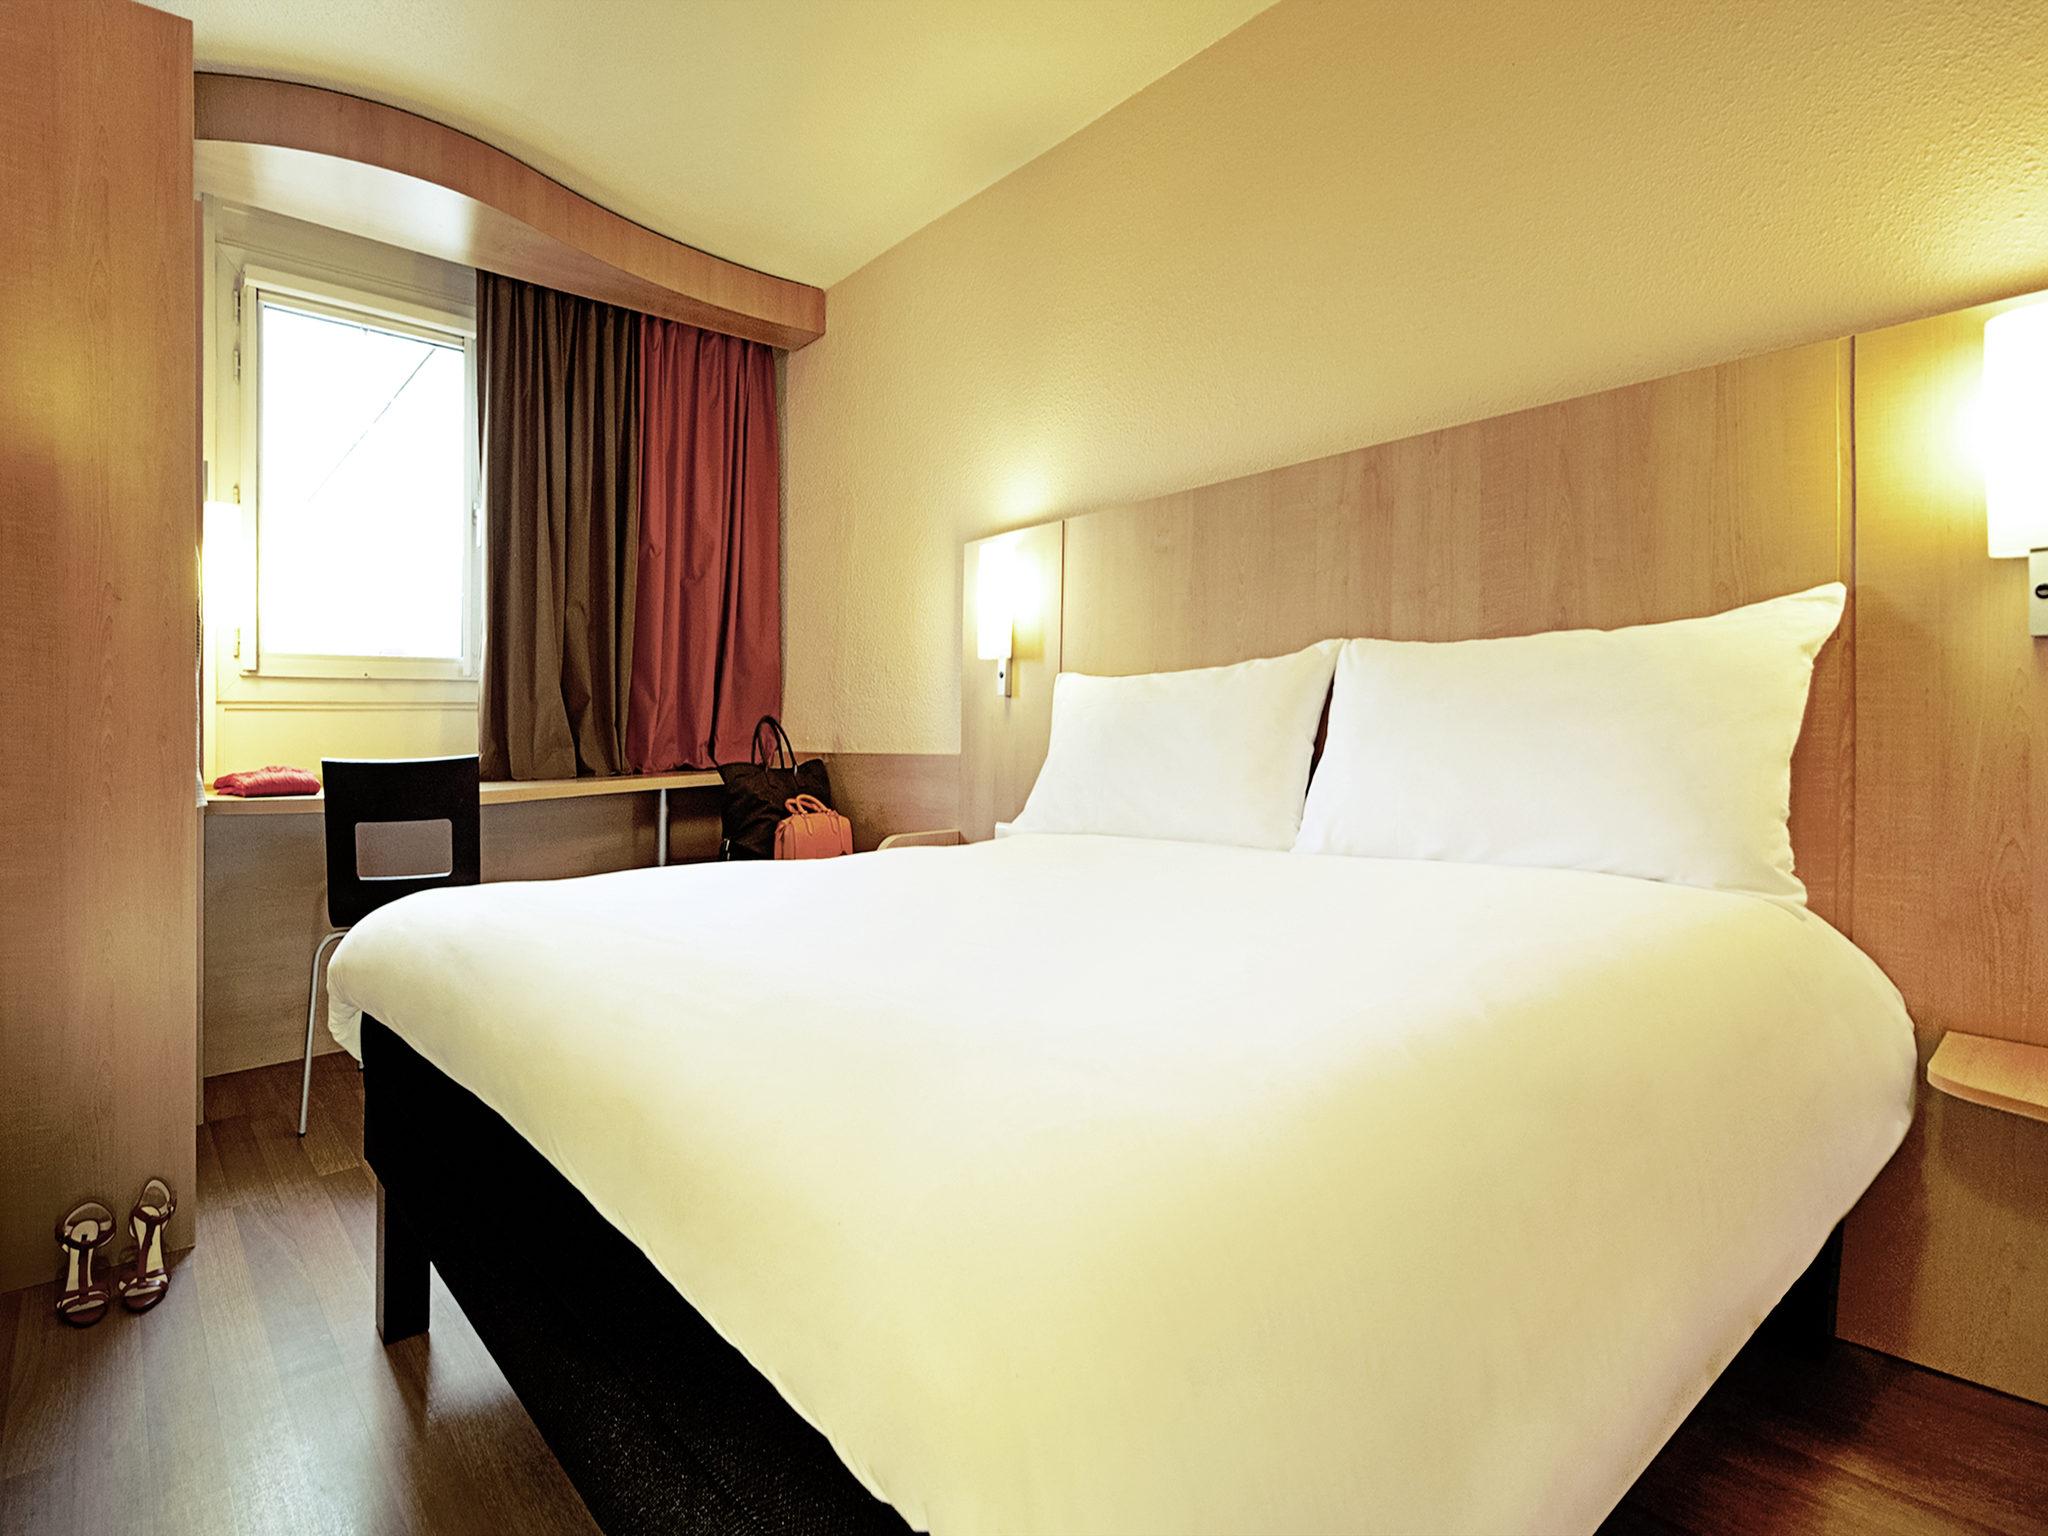 Hotel in girona book at this ibis hotel in girona for Hotel familiar girona